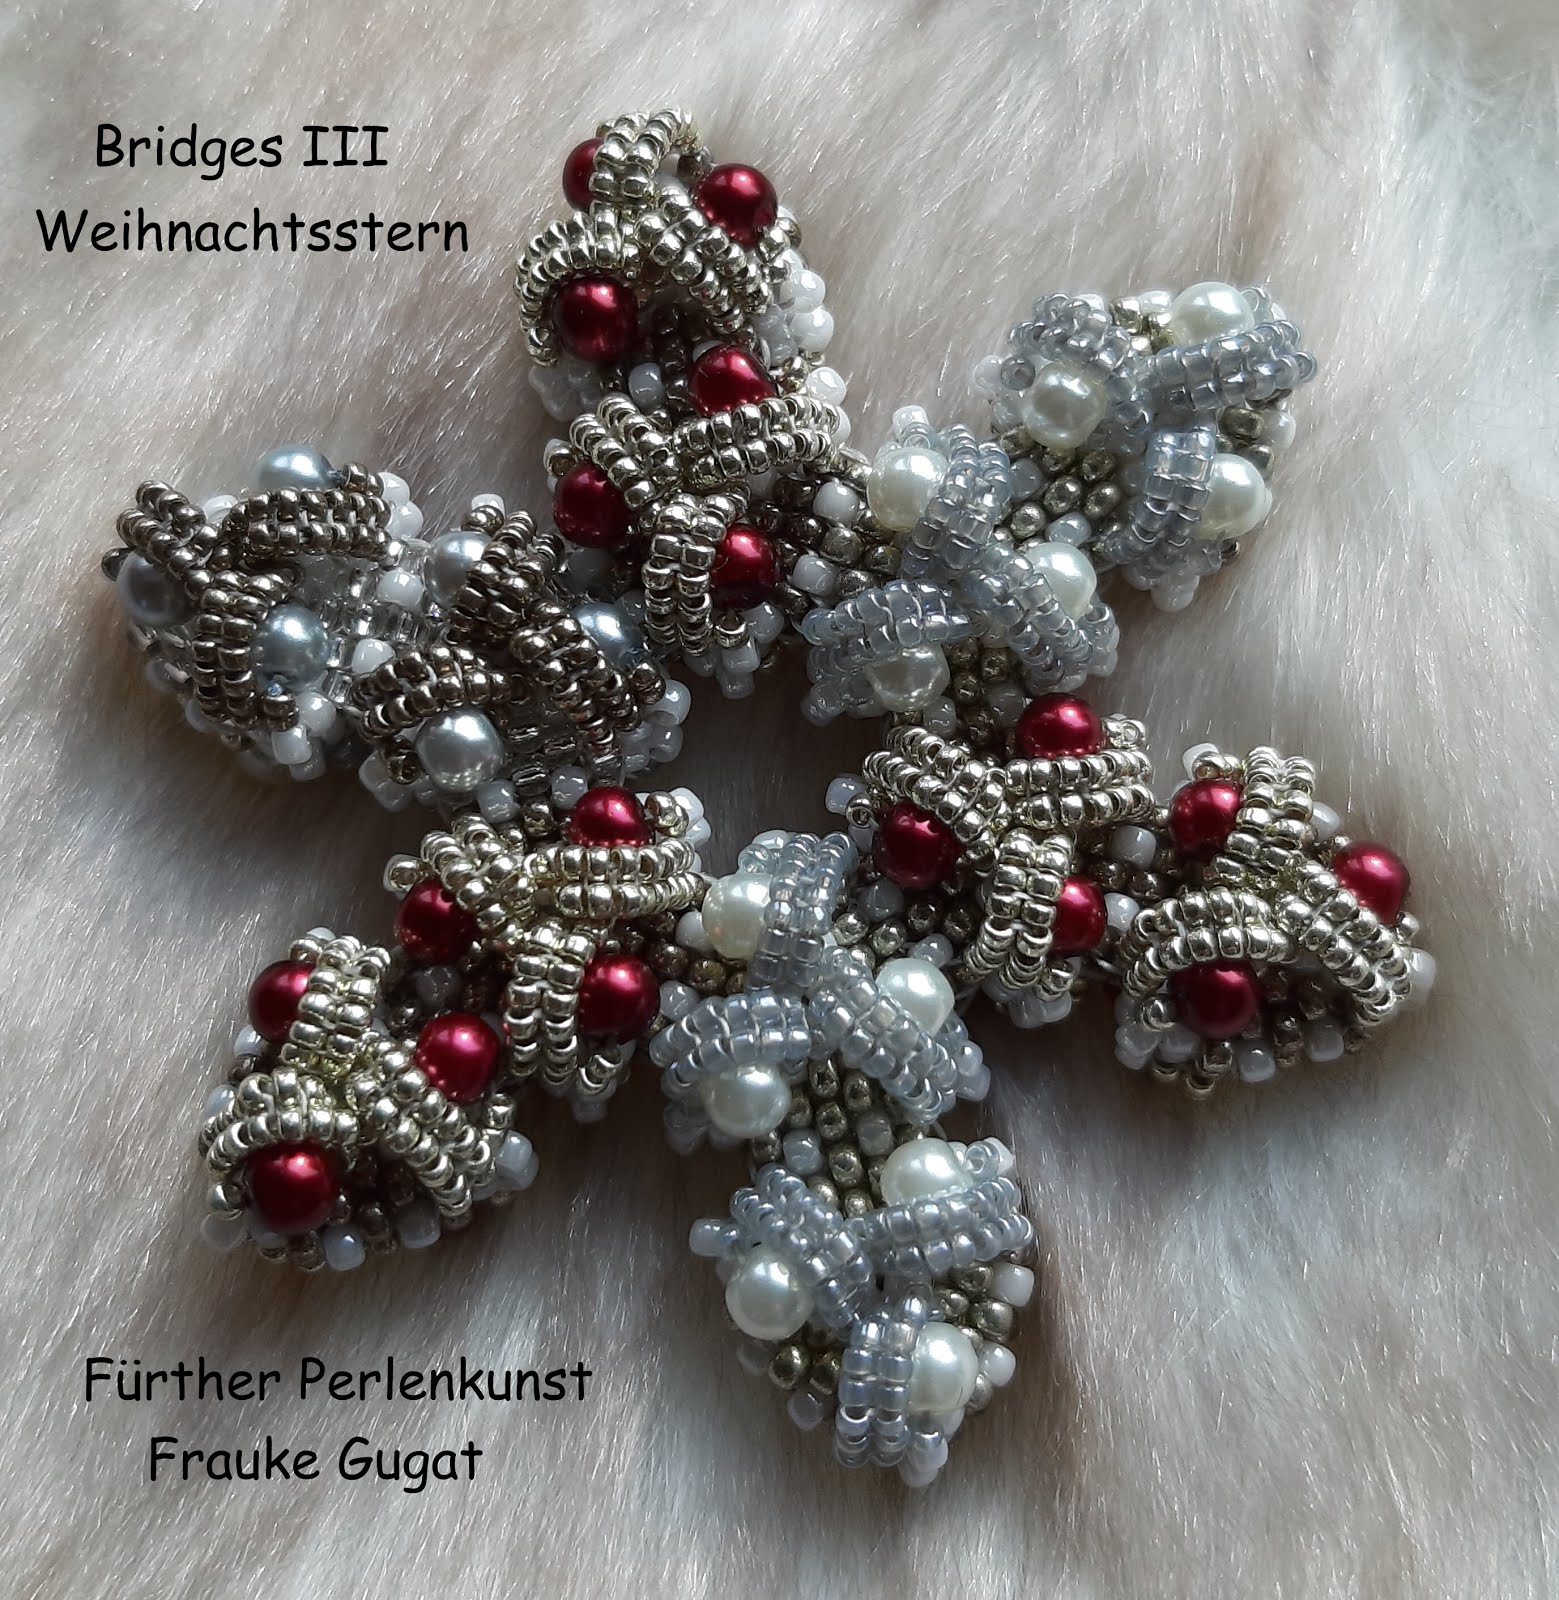 Bridges III - Stern